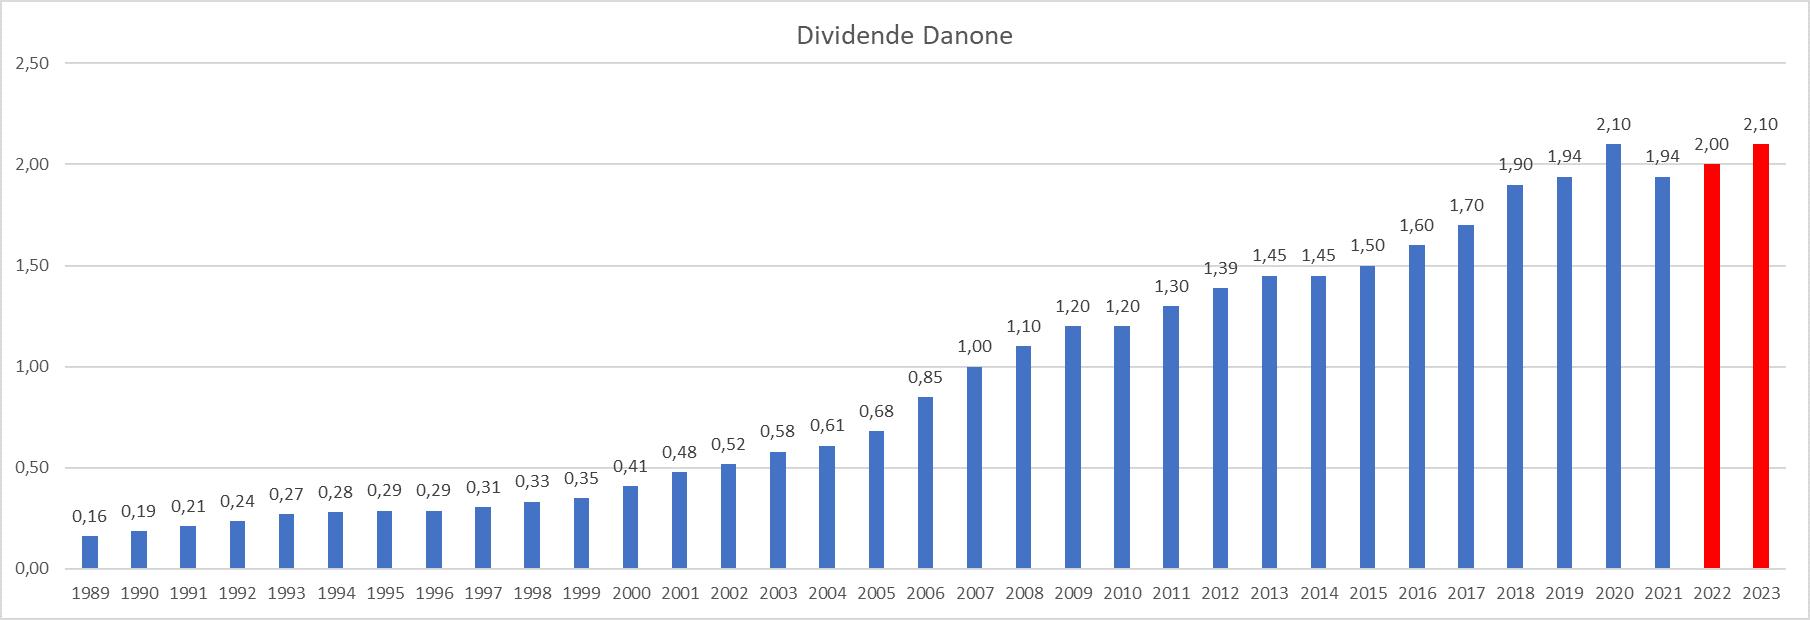 Dividend Aristocrats France Danone